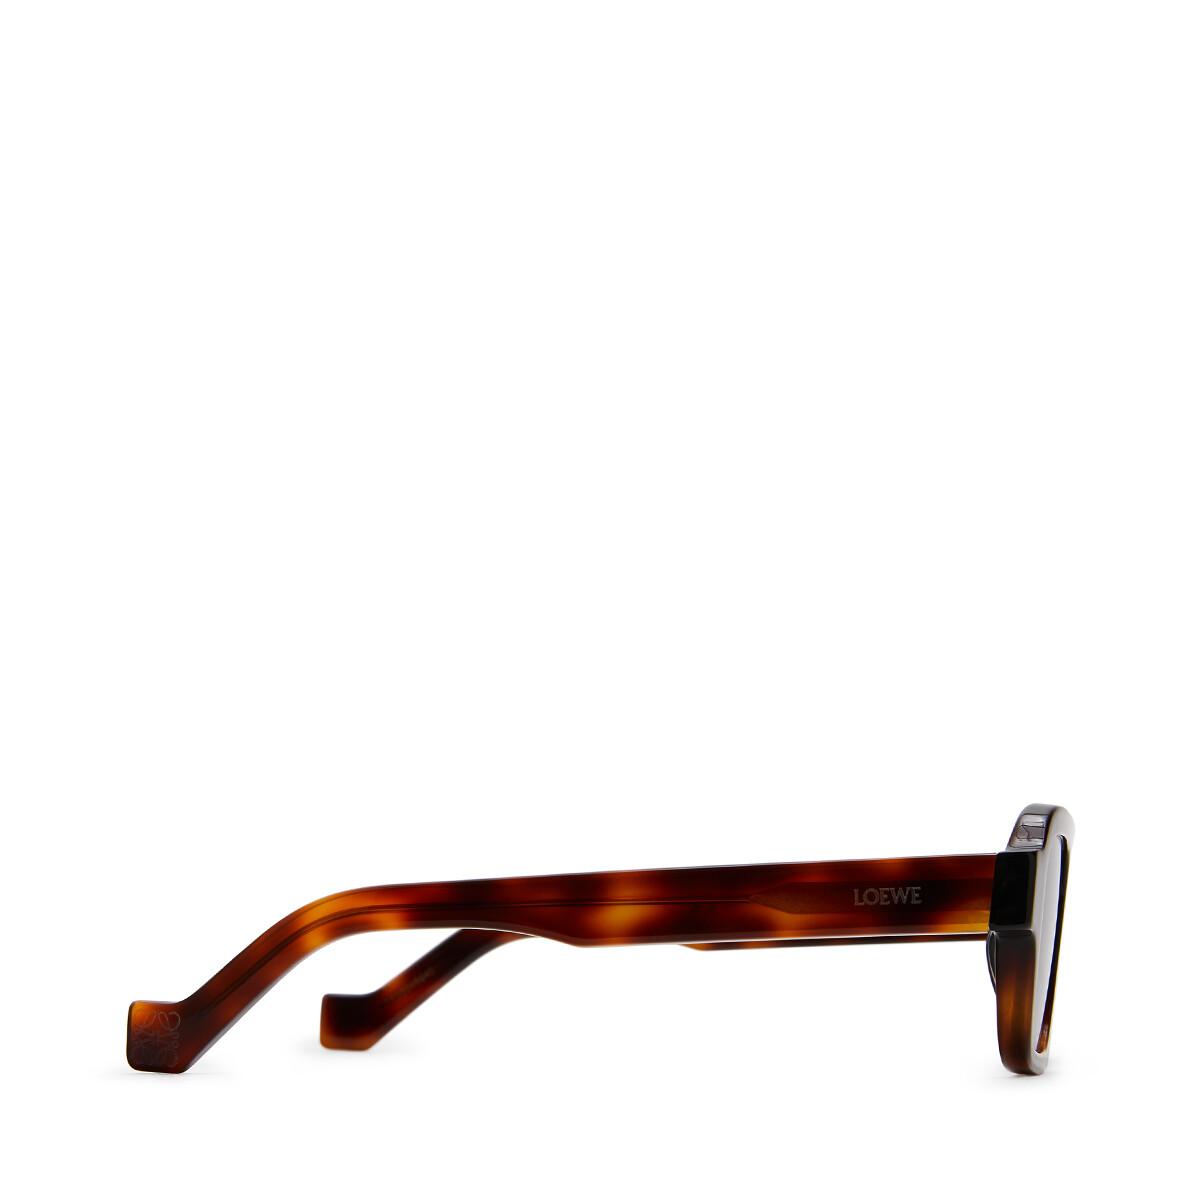 LOEWE Square Sunglasses Black/Havana front